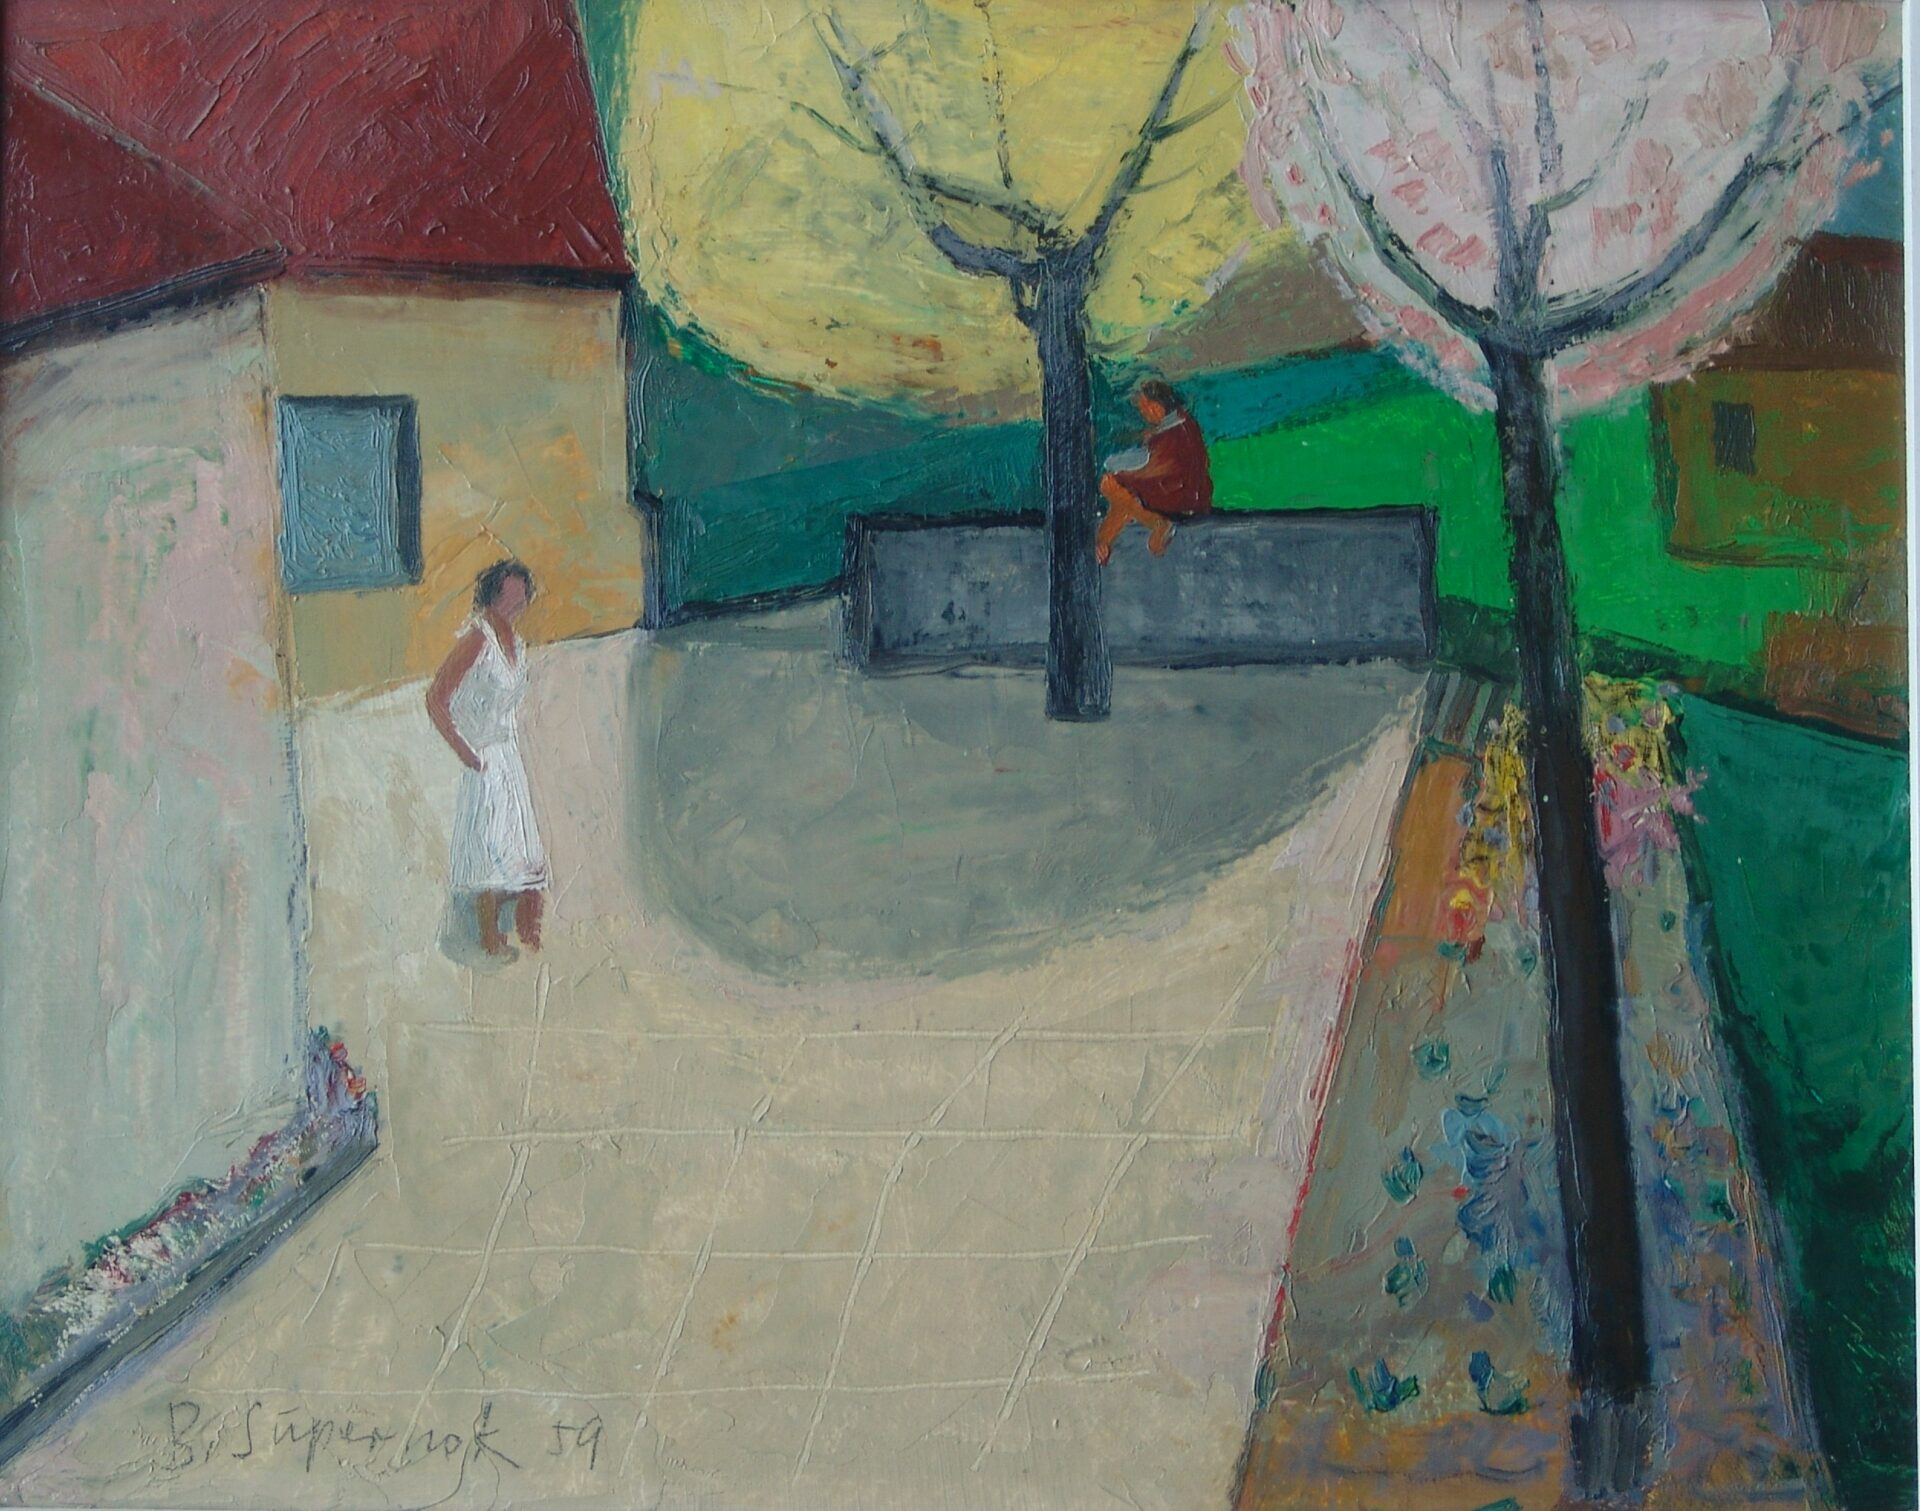 Bruno Supernok, Straßenszene, 1959